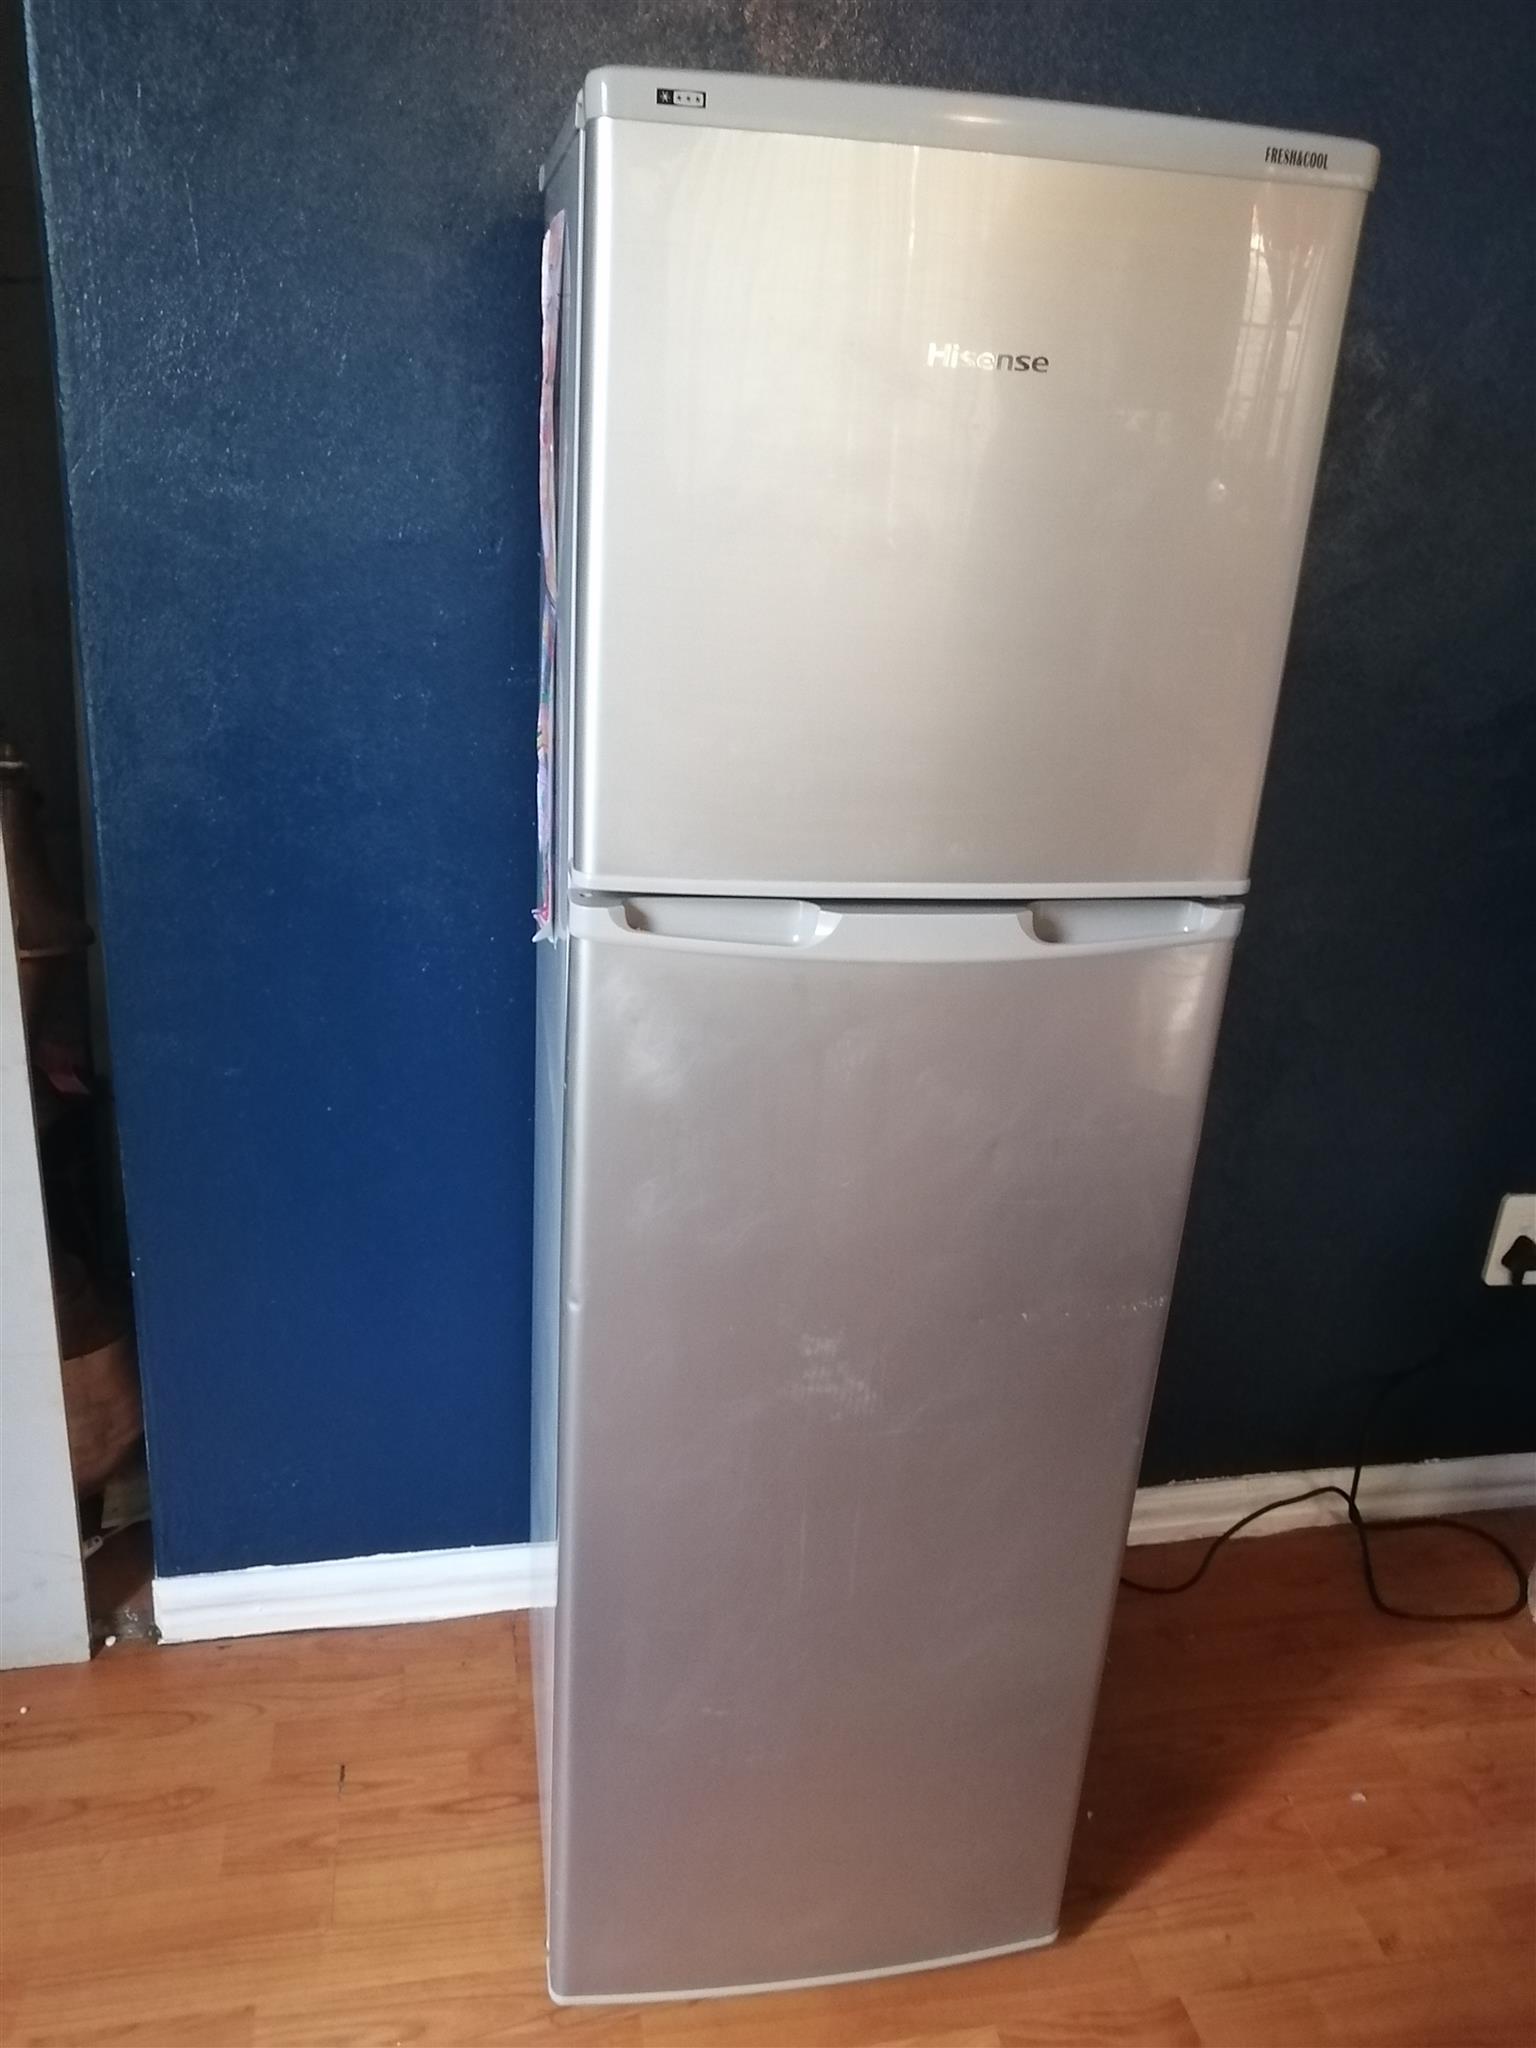 Hisense 161L Top Freezer Fridge